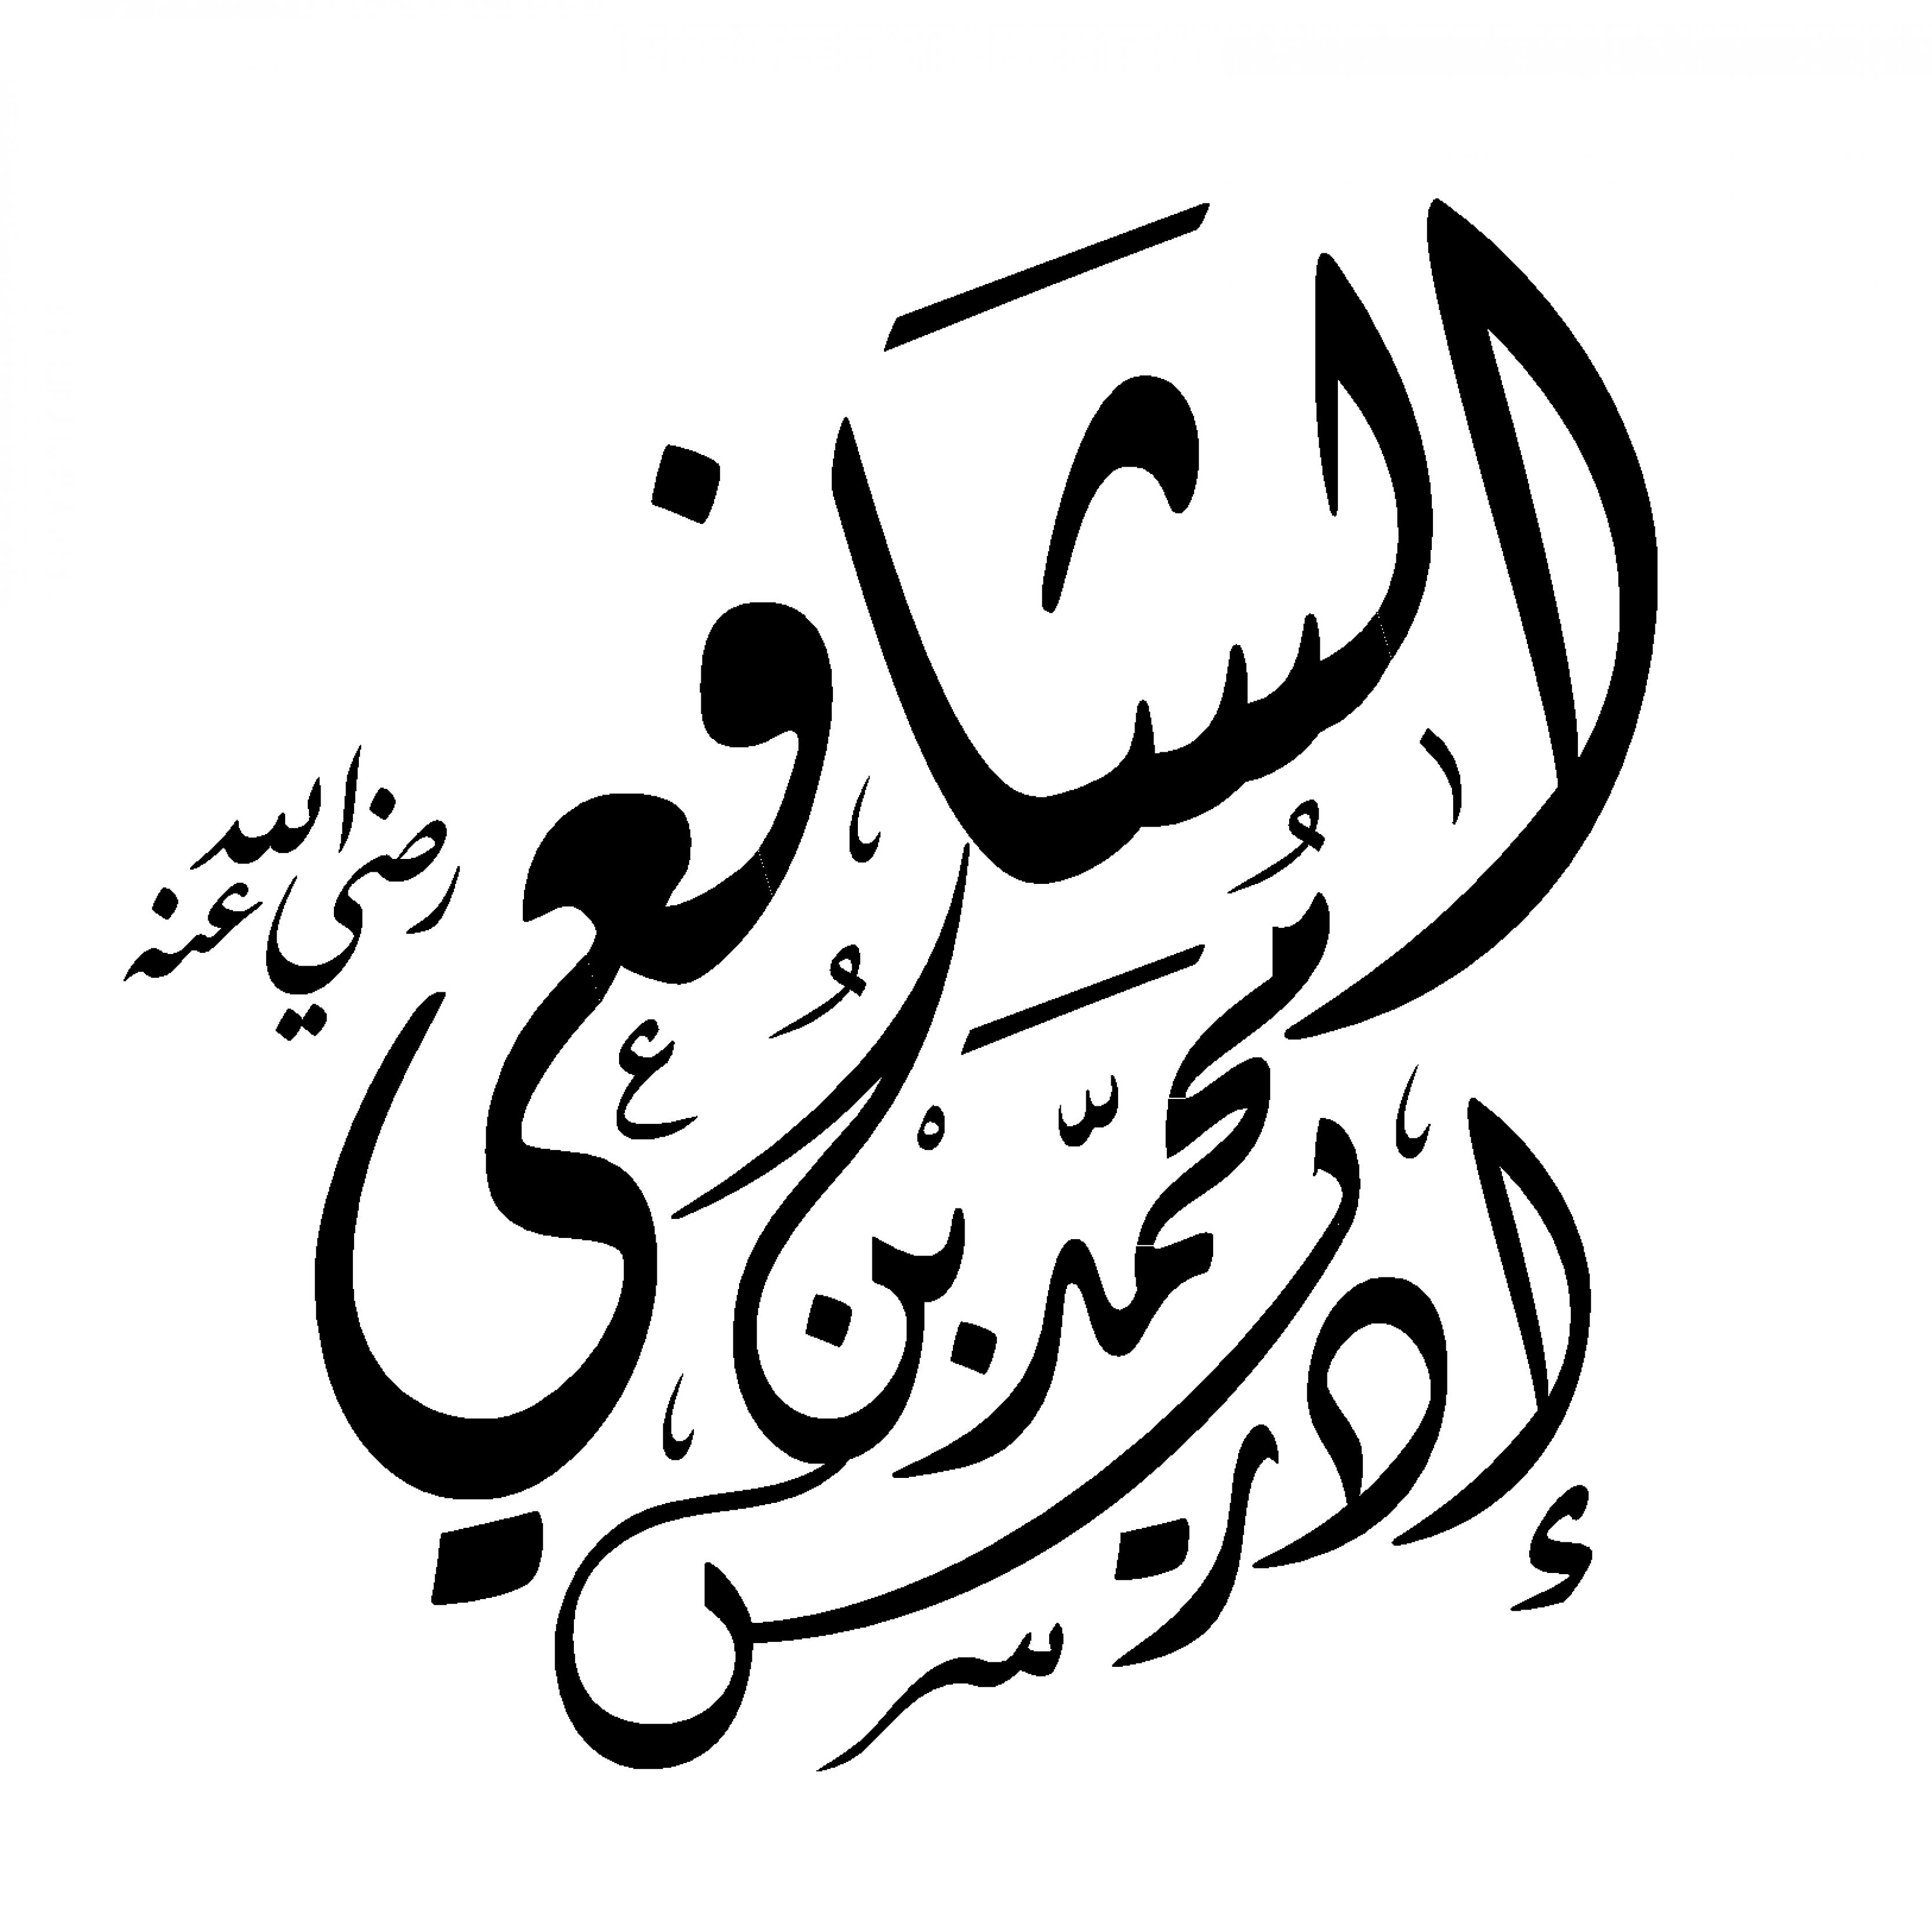 صوره موضوع عن حكم الشافعي